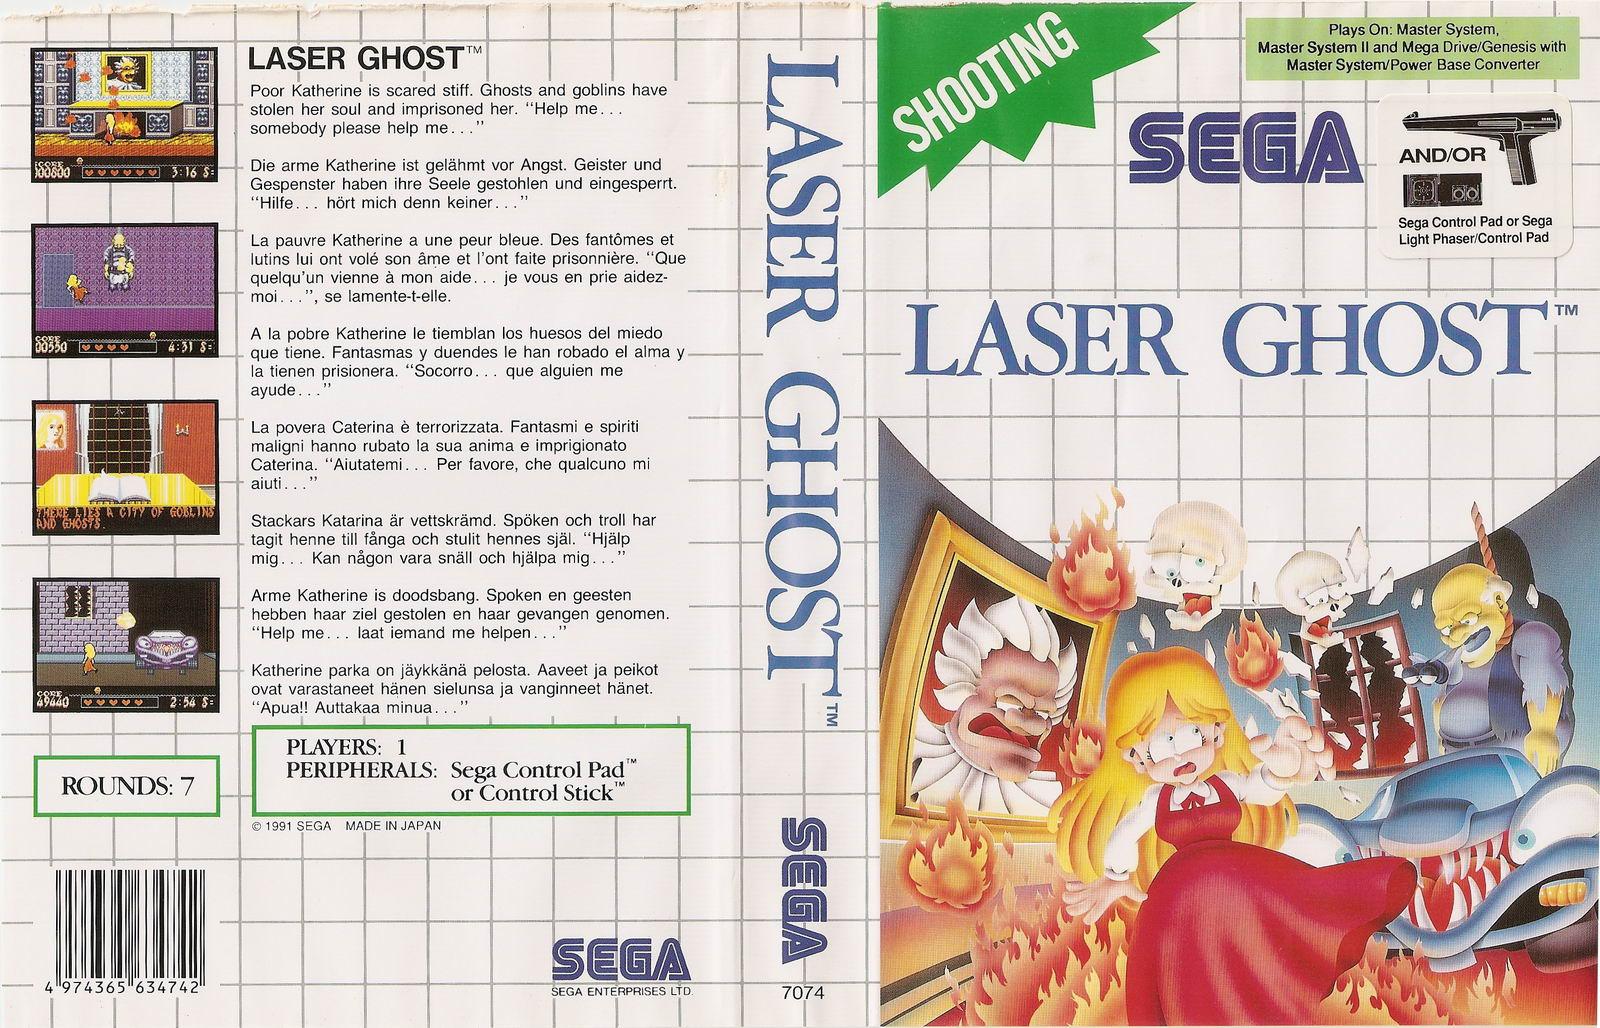 [Master System] Les Jeux Light Phaser LaserGhost-SMS-EU-Sticker